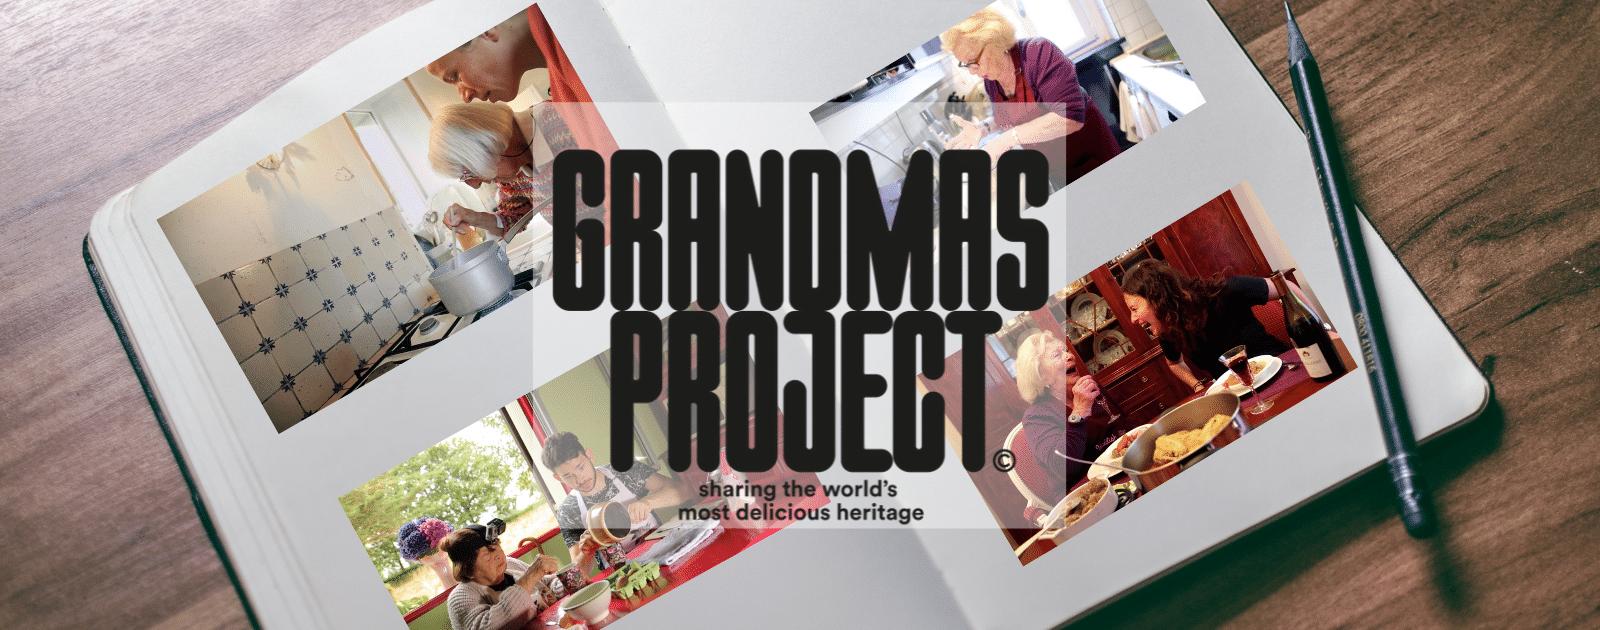 Grandmas project